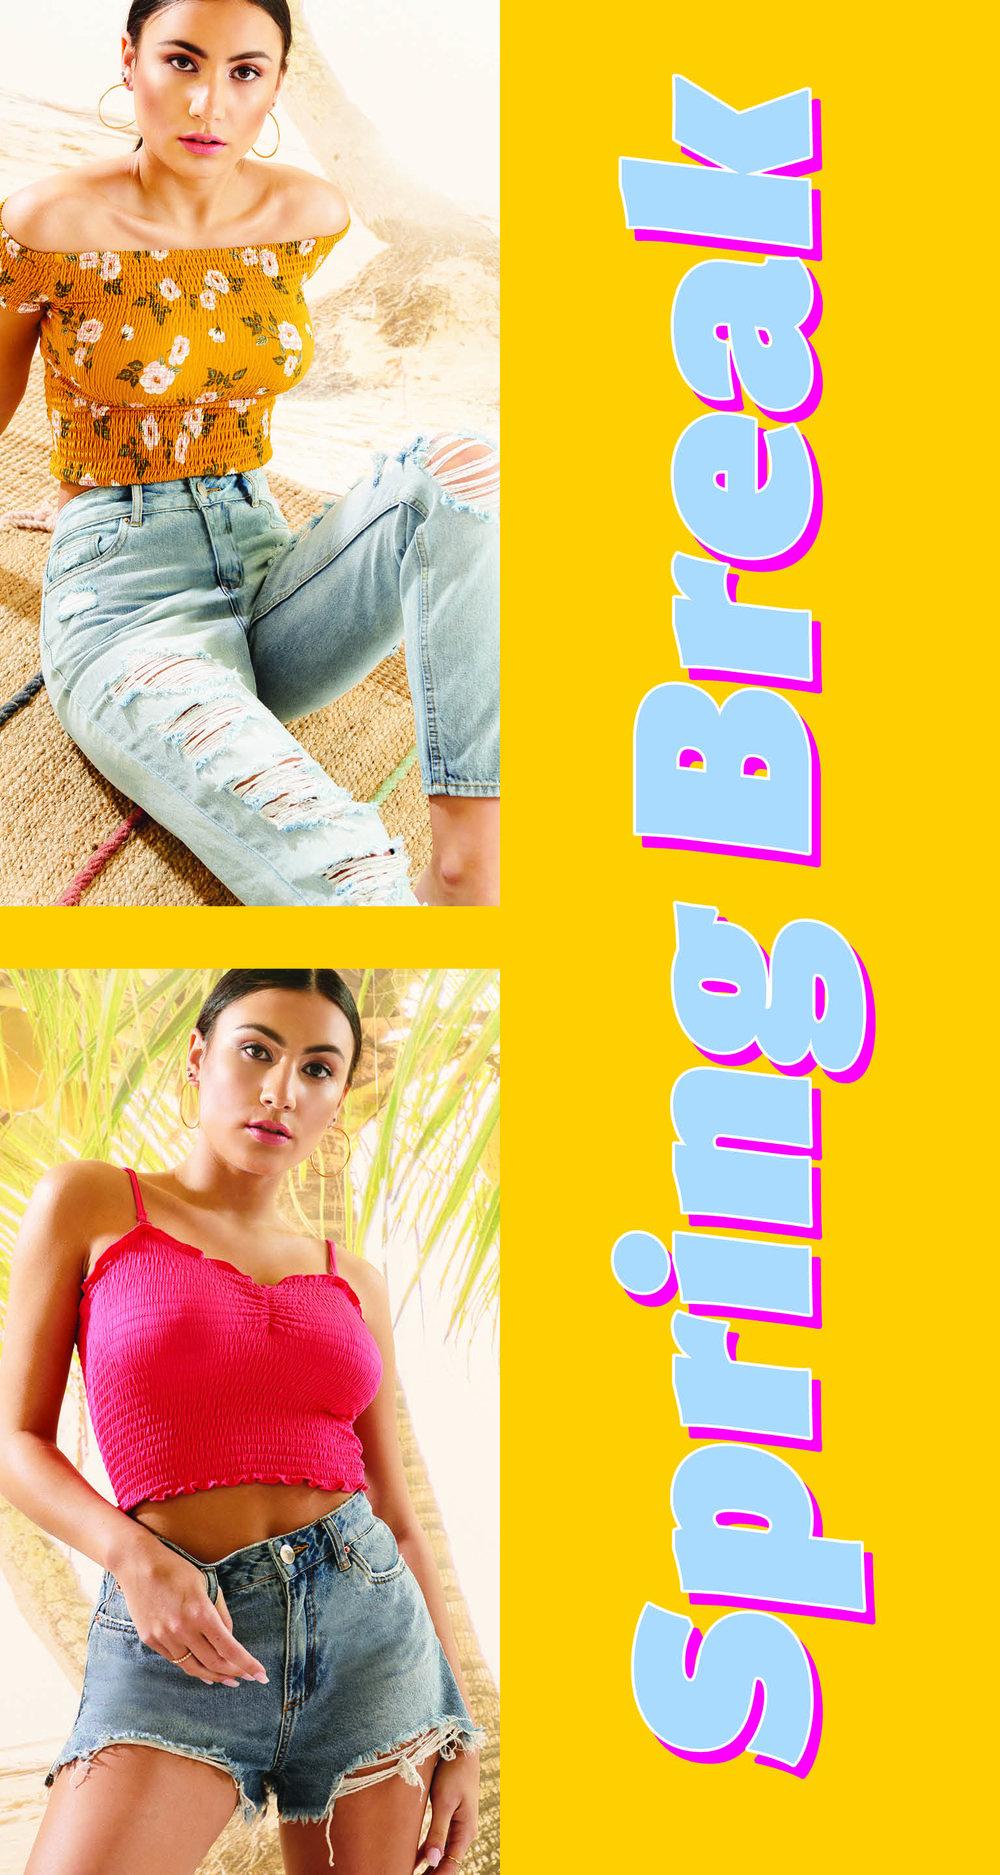 UP_Sbreak19_Posters_02.jpg